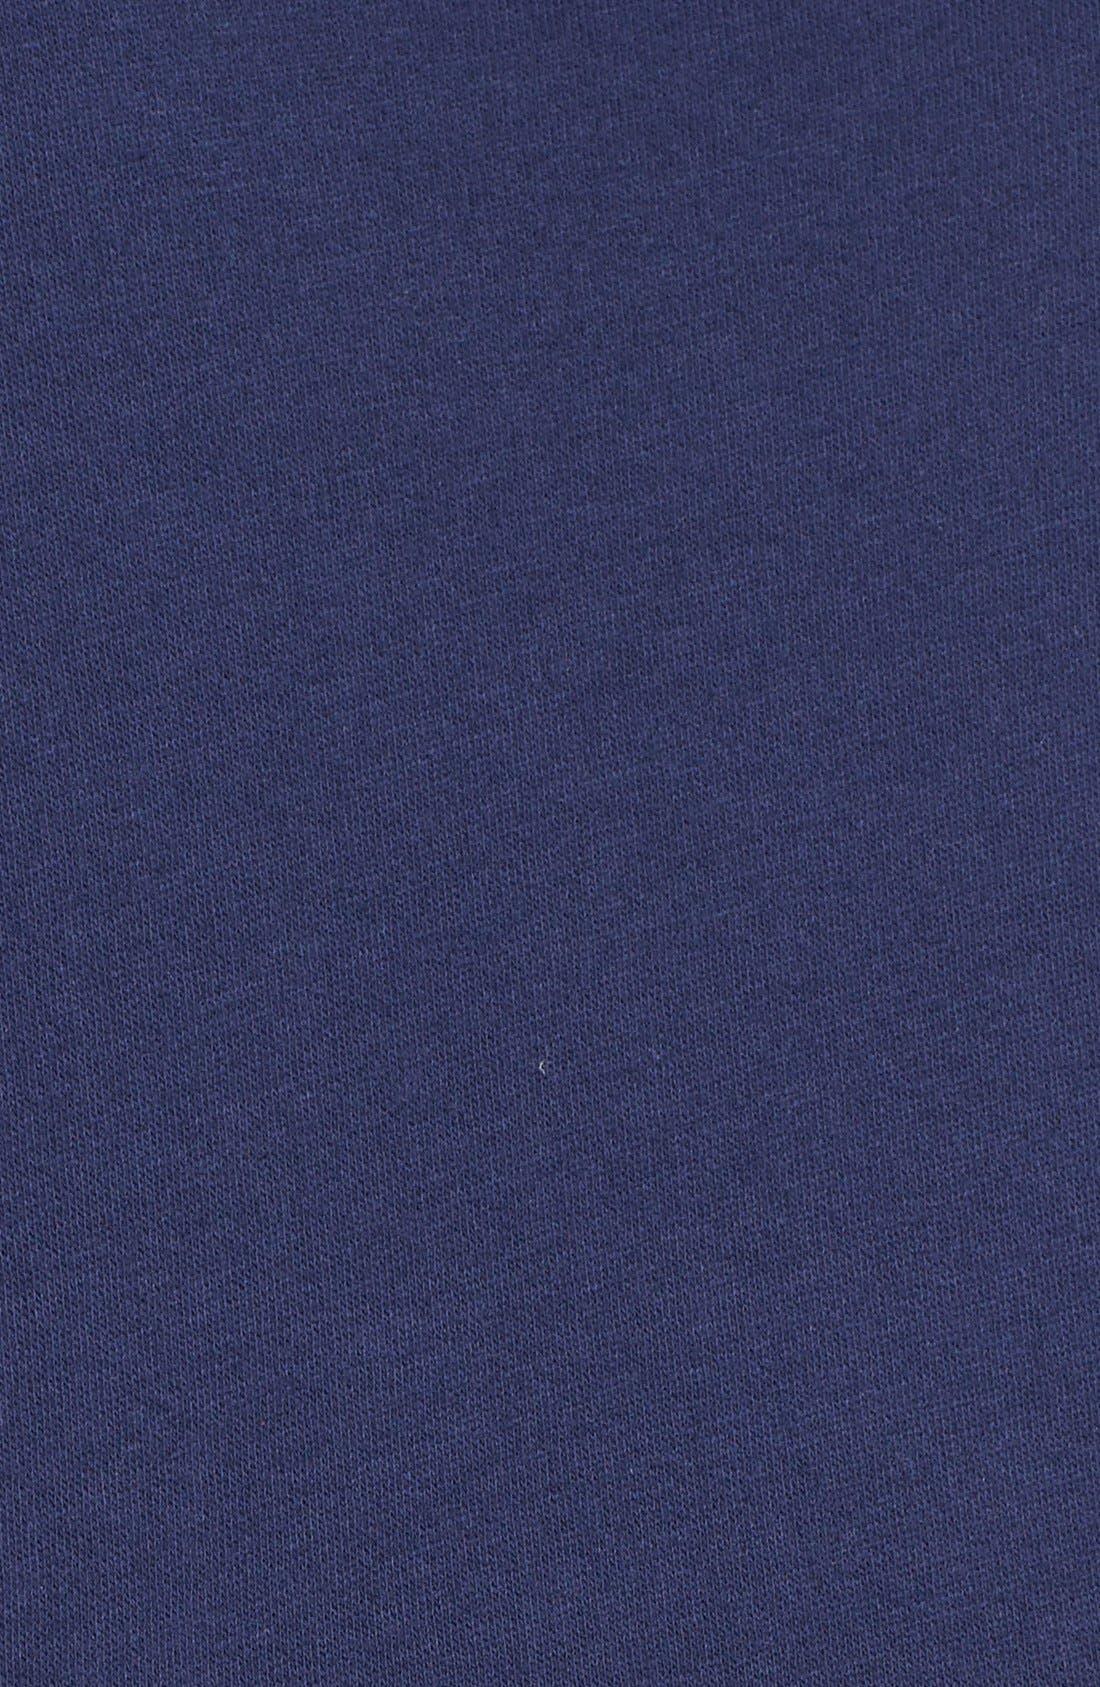 Alternate Image 3  - Caslon Cowl Neck Pullover (Plus Size)